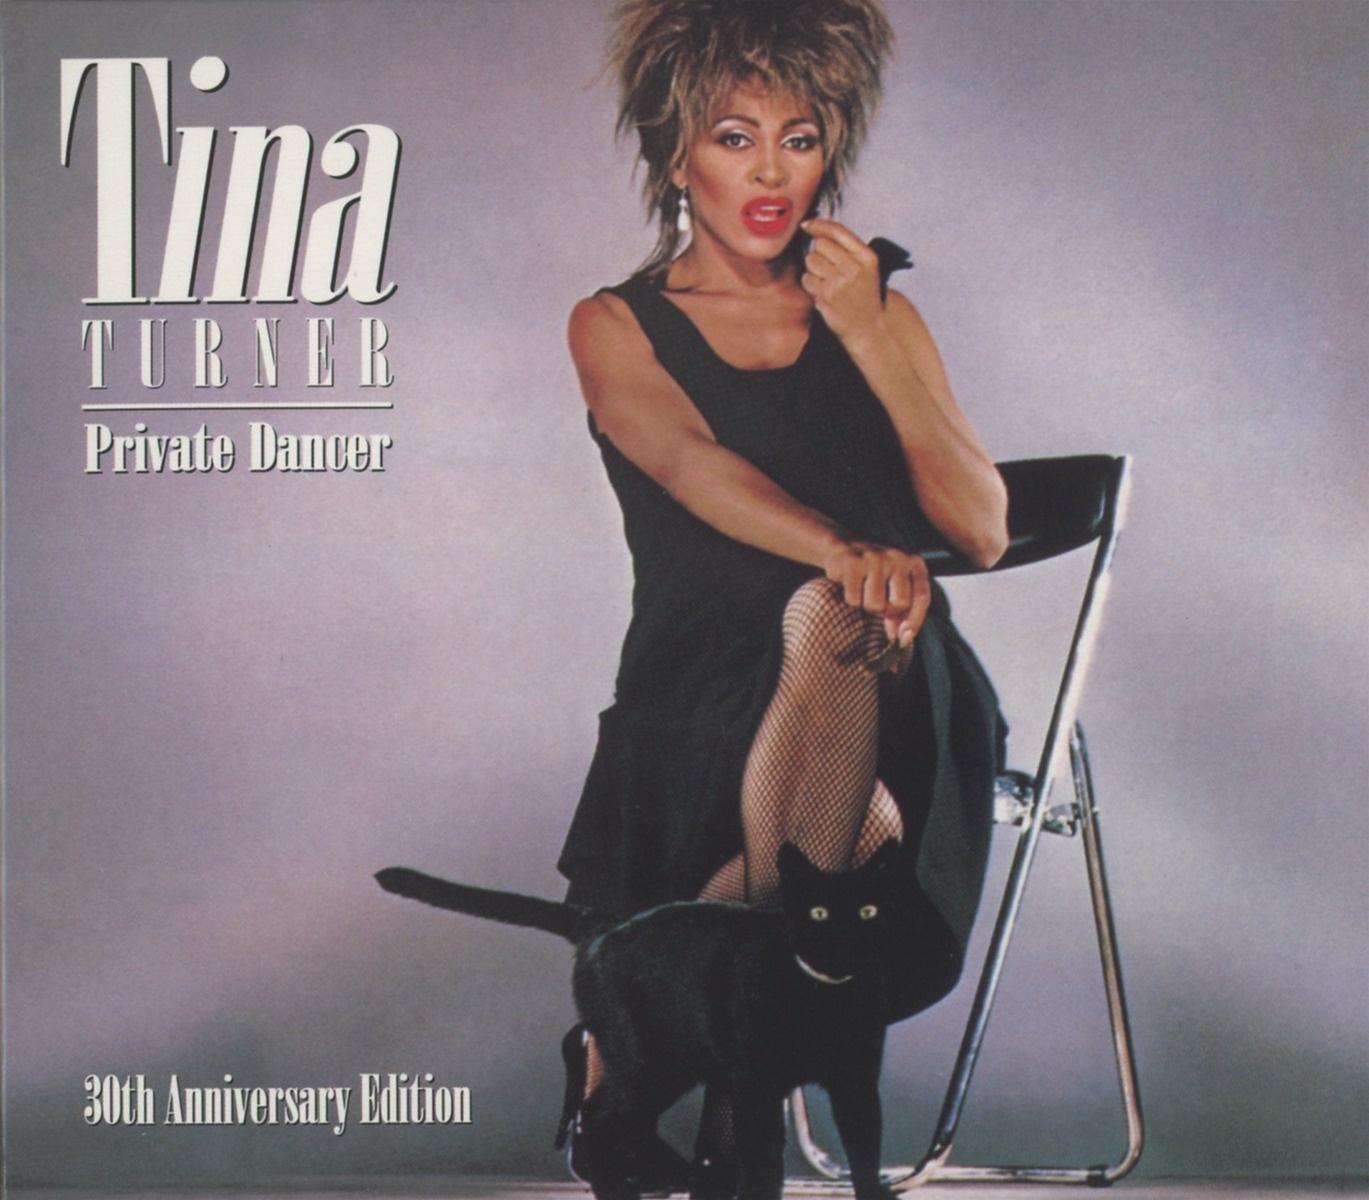 Private dancer (Foto: Tina Turner)